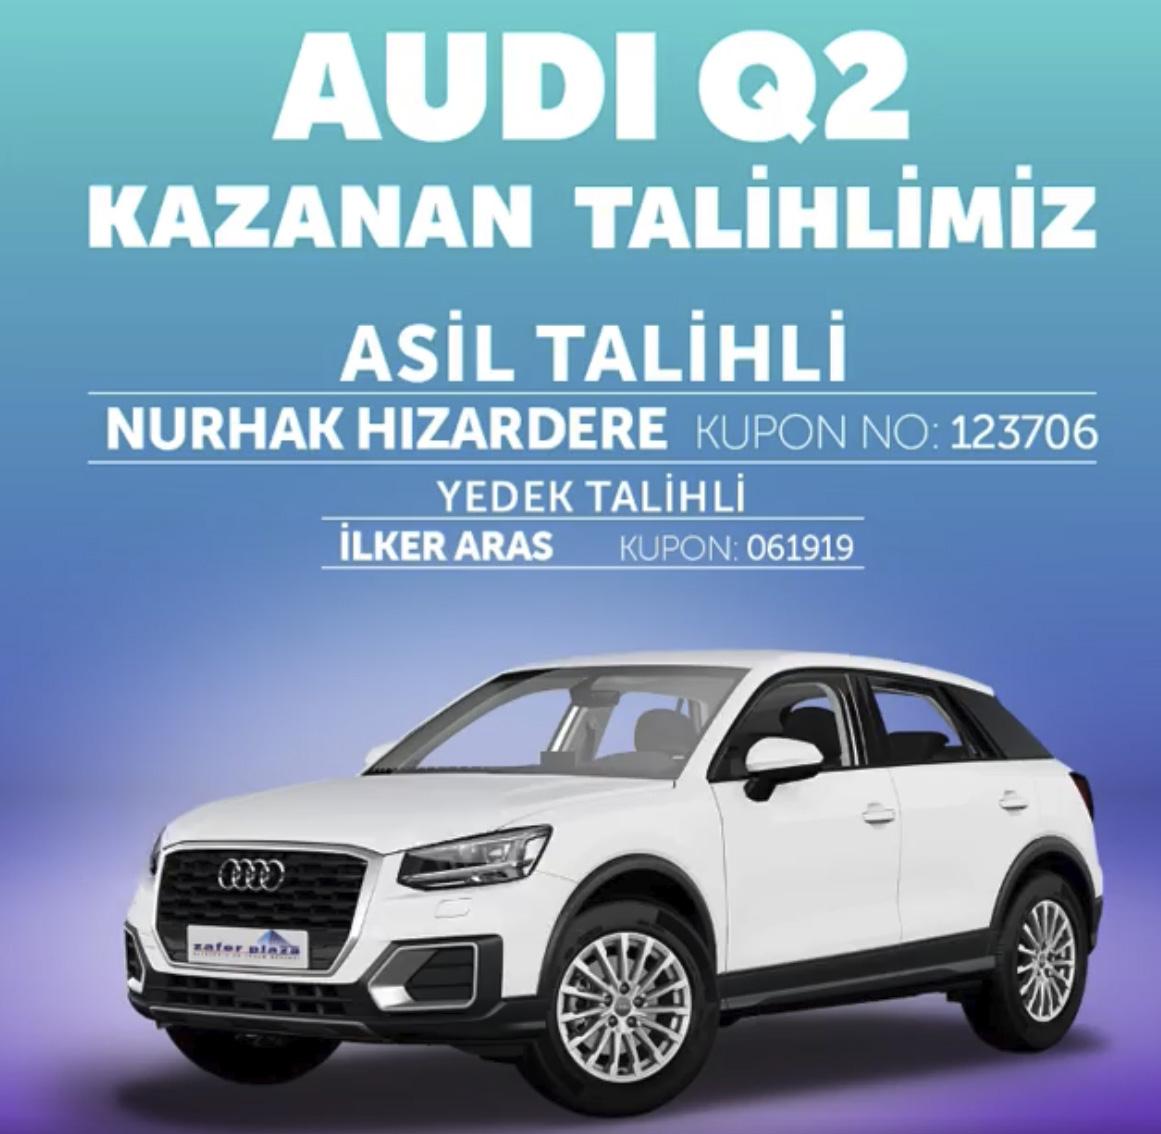 Q7'de kazanan Talihli